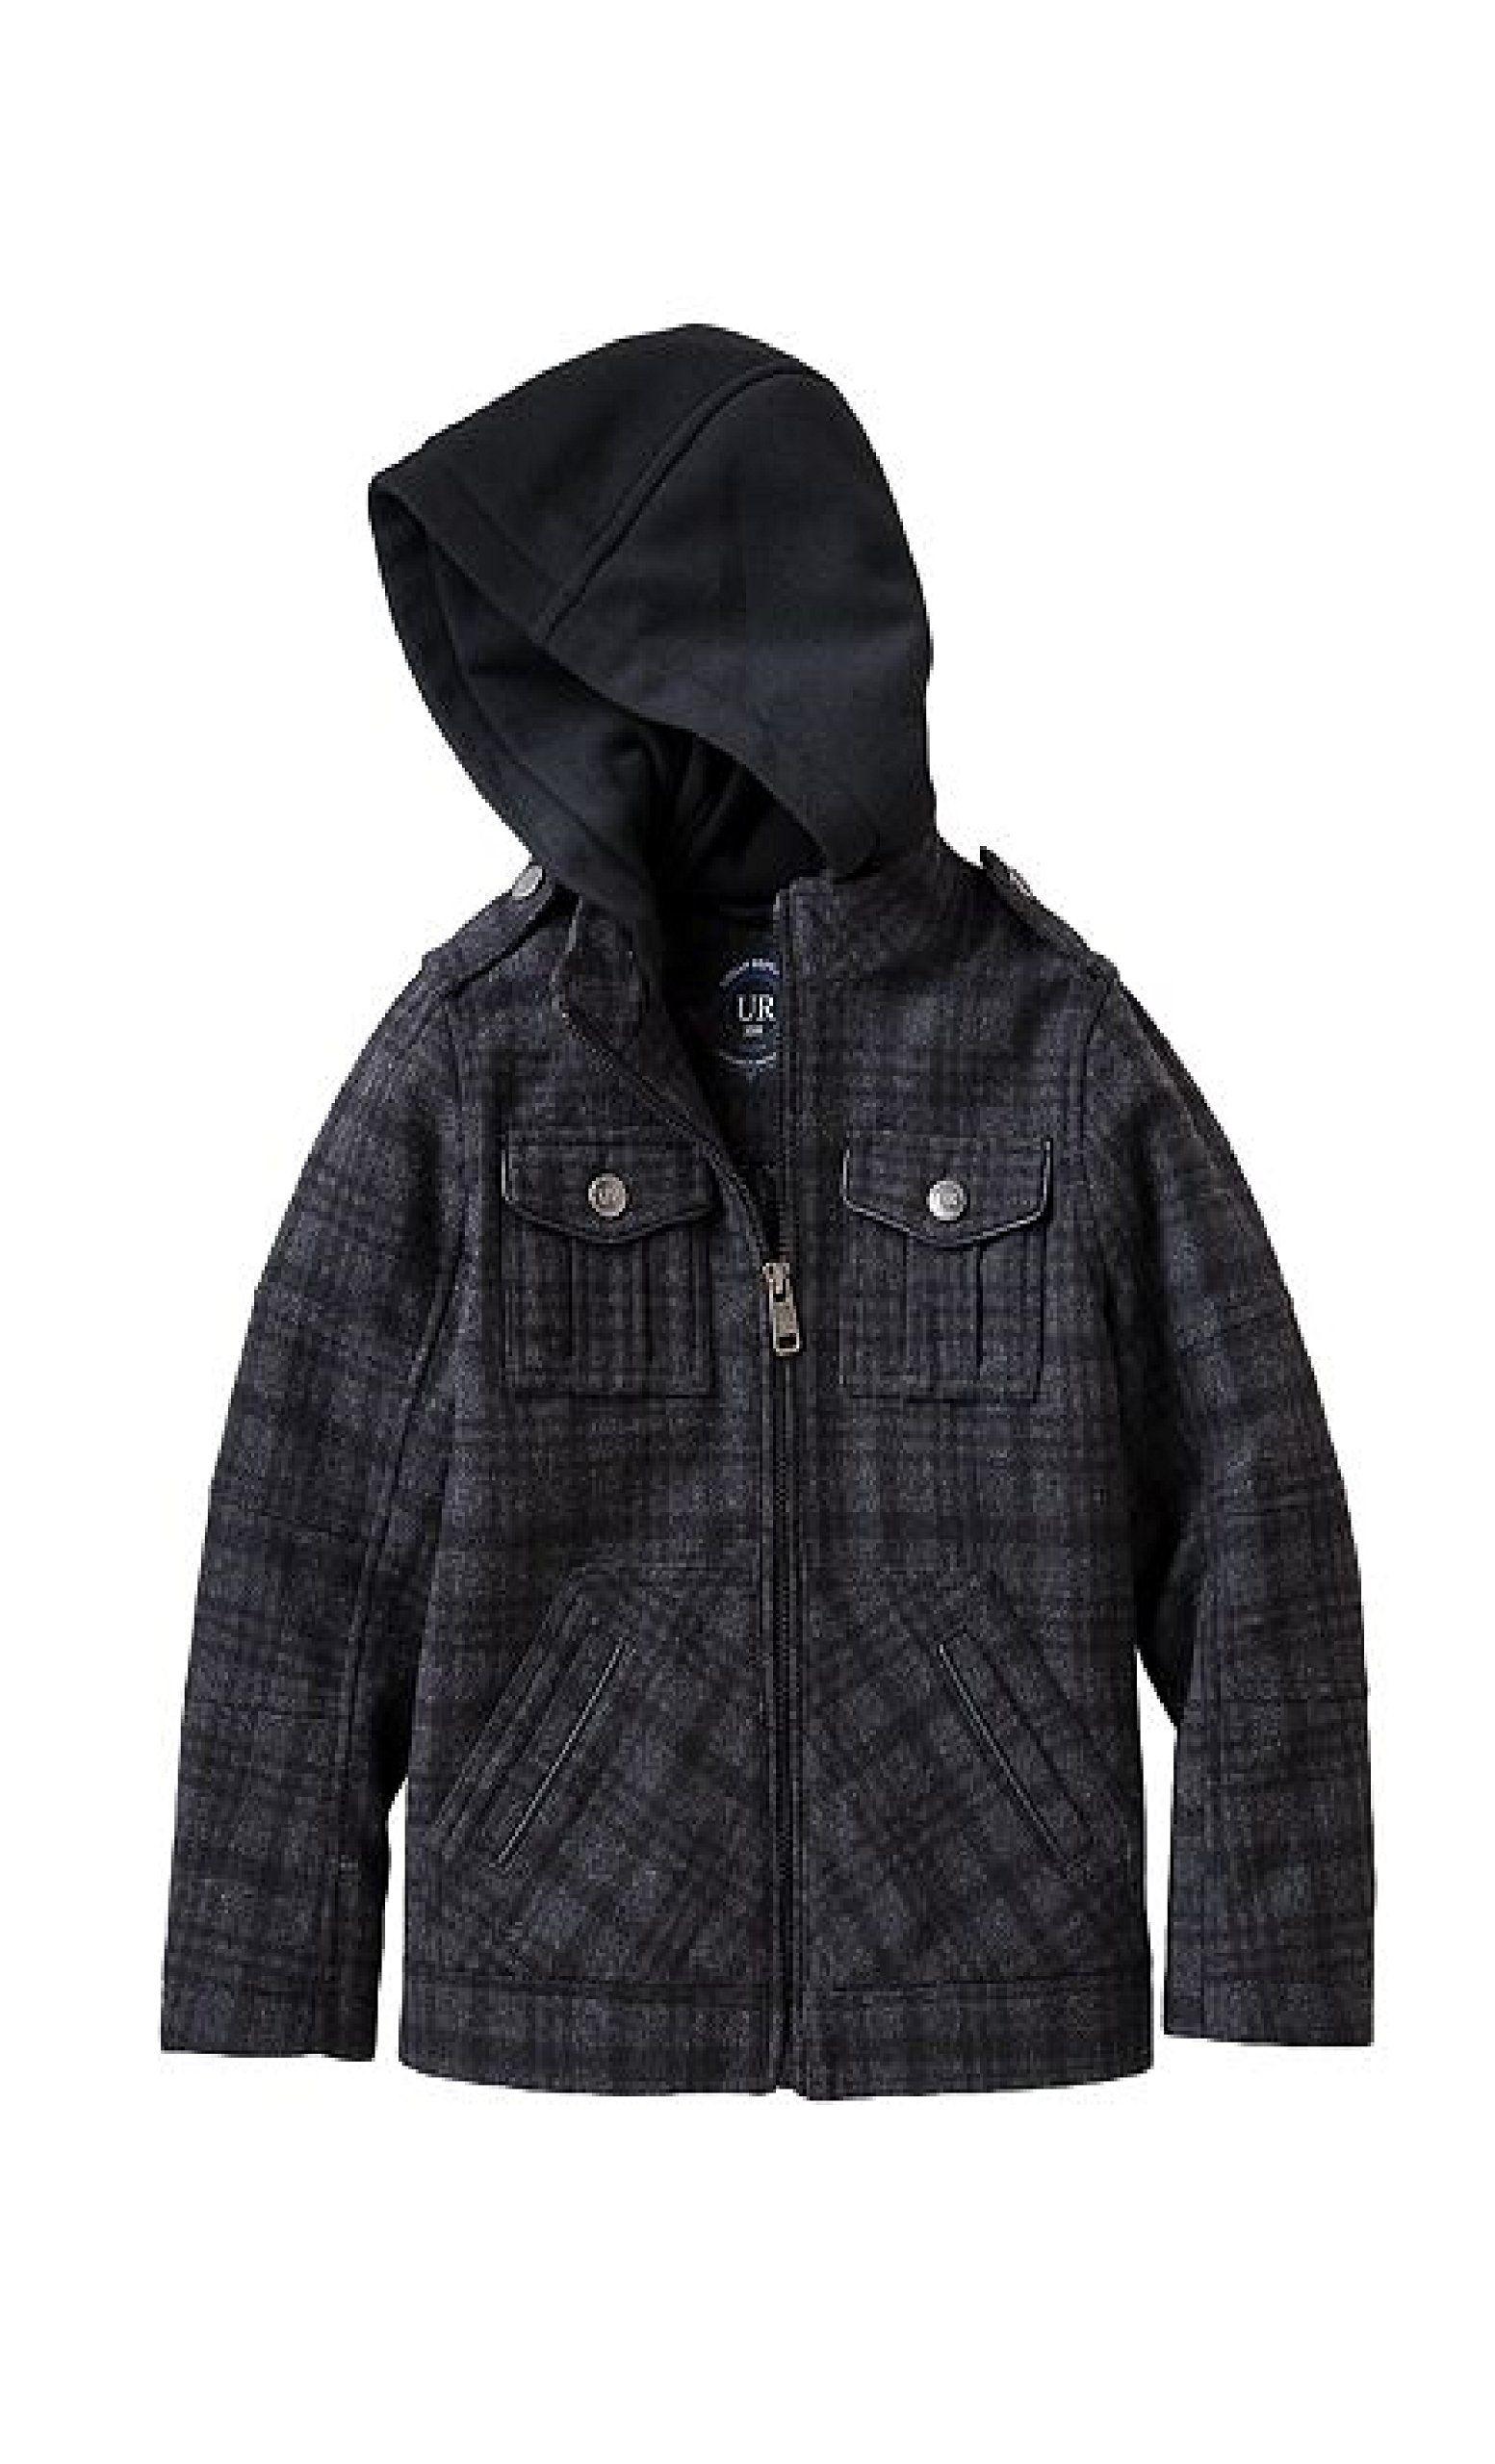 8af6c925c6a3 Urban Republic Little Boys Hooded Dressy Classic Wool Blend Padded ...